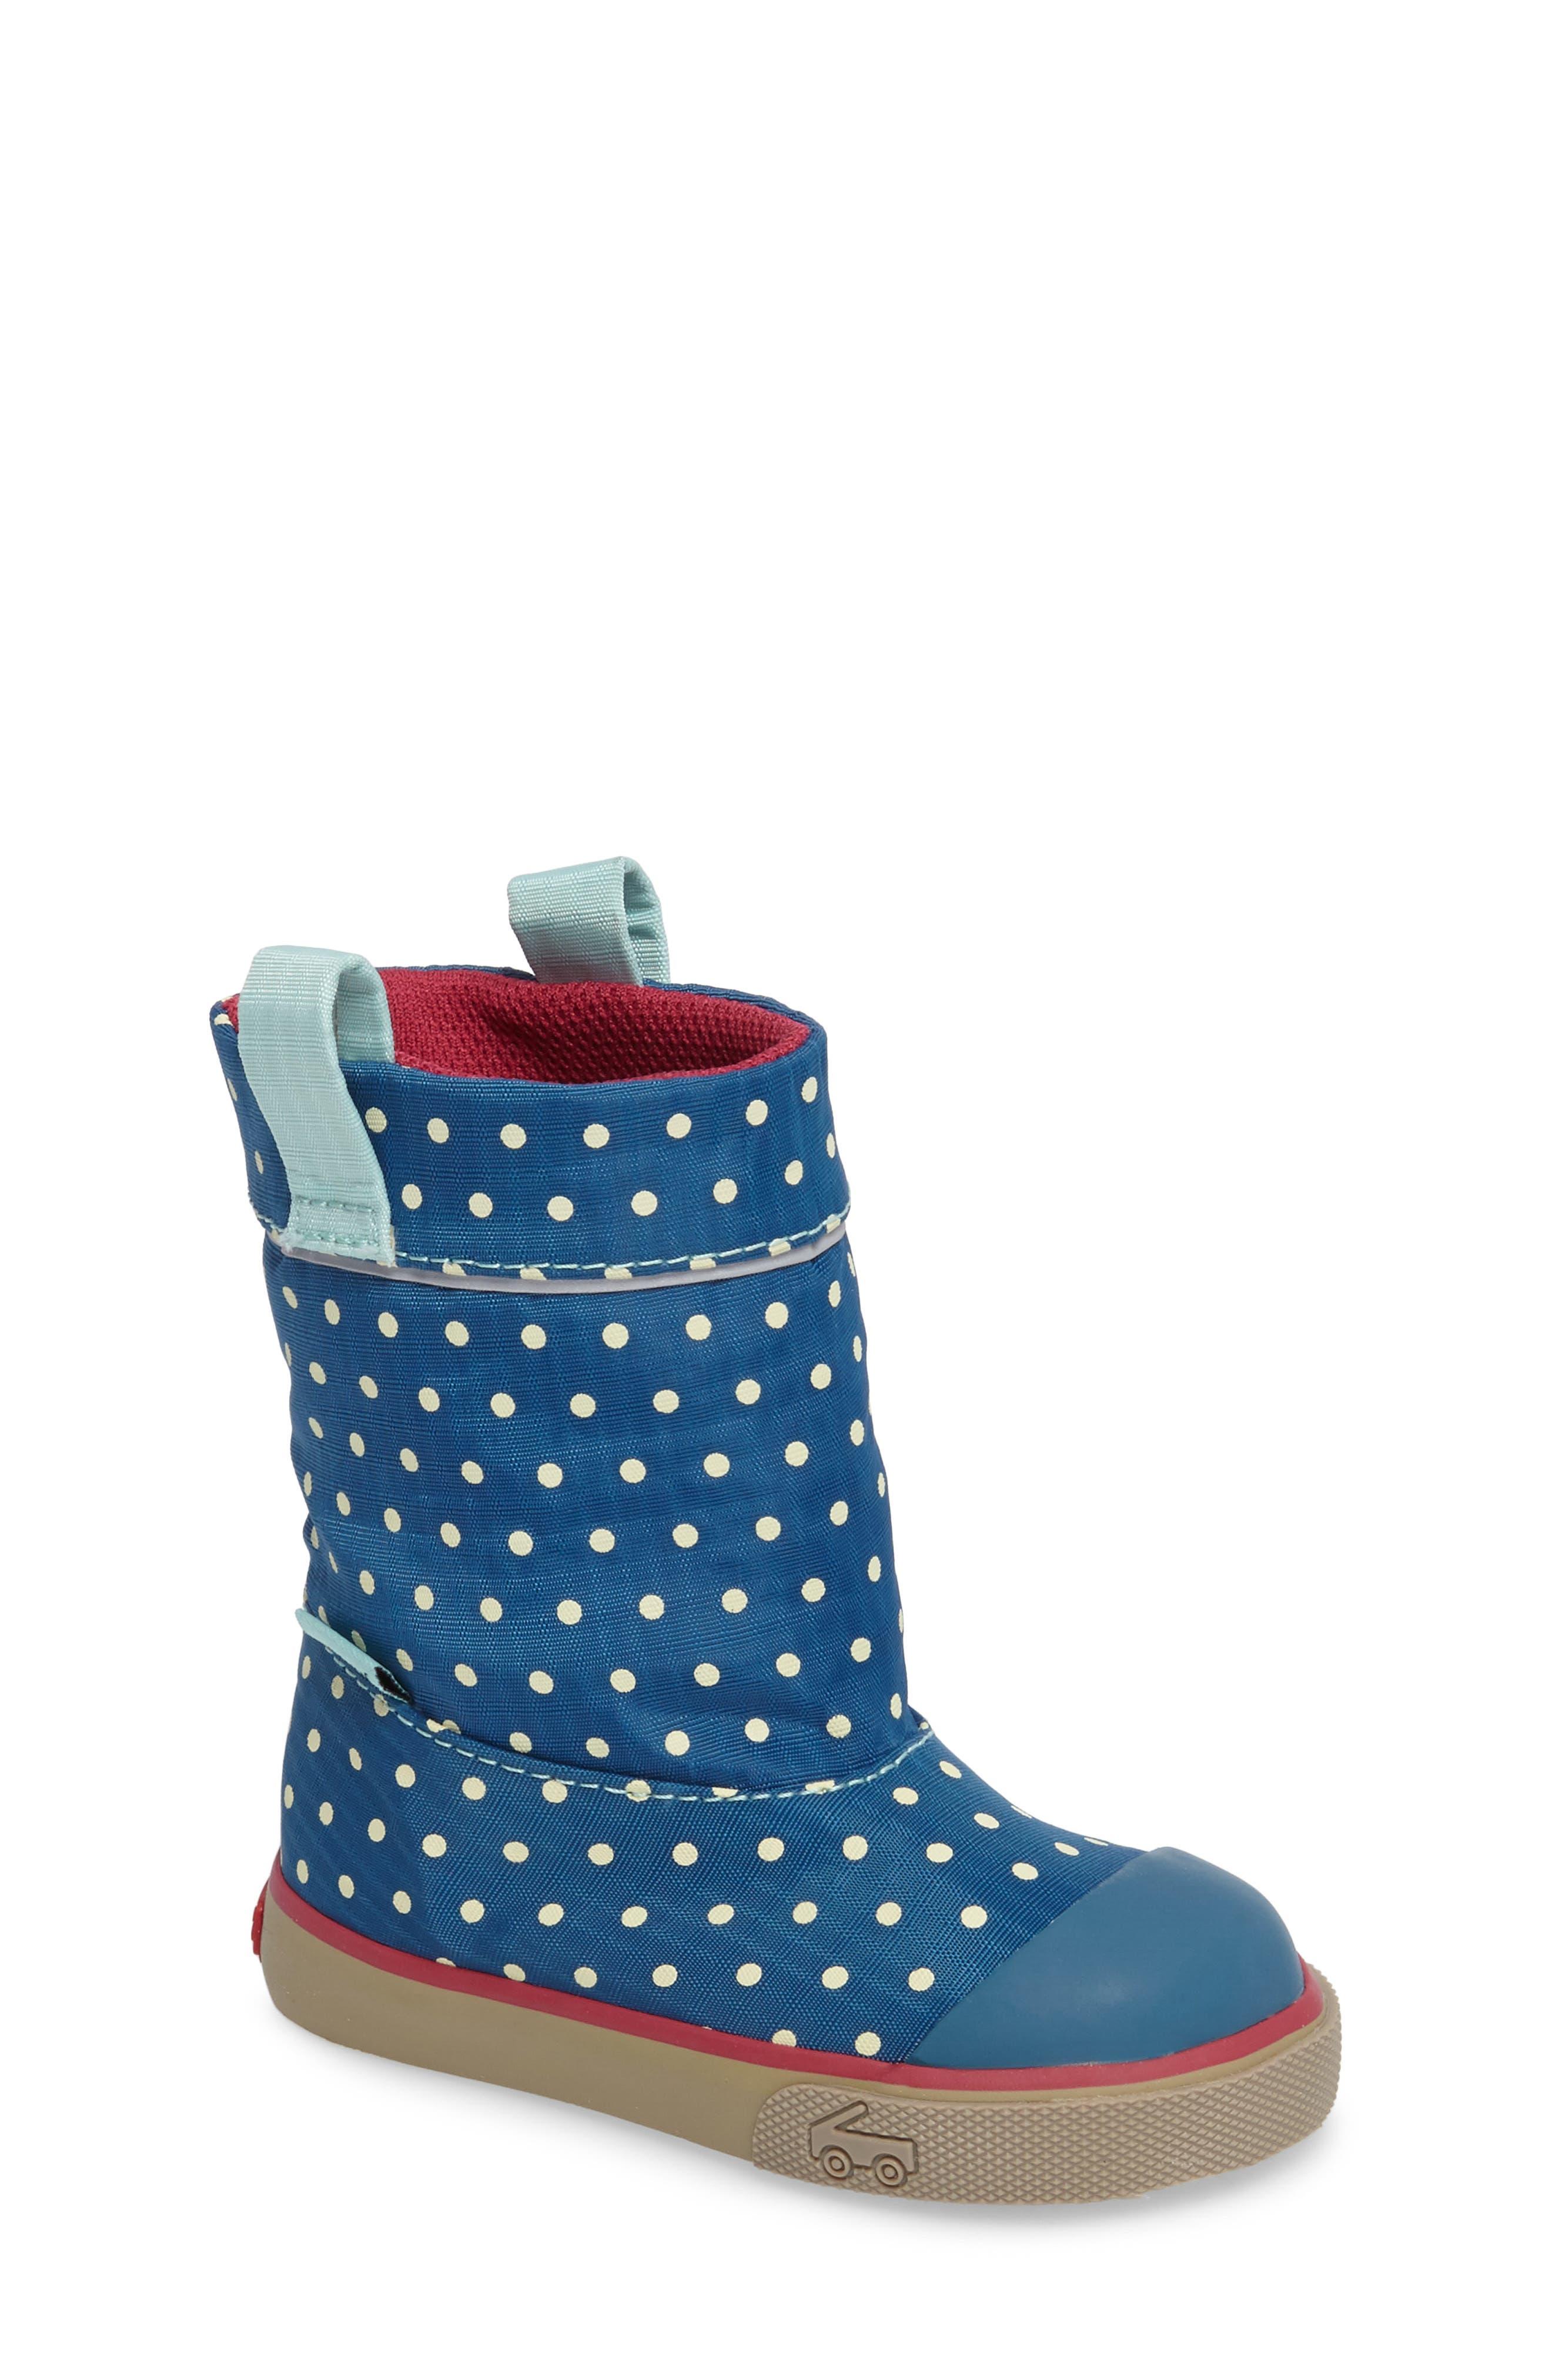 Montlake Waterproof Boot,                         Main,                         color, Dark Blue